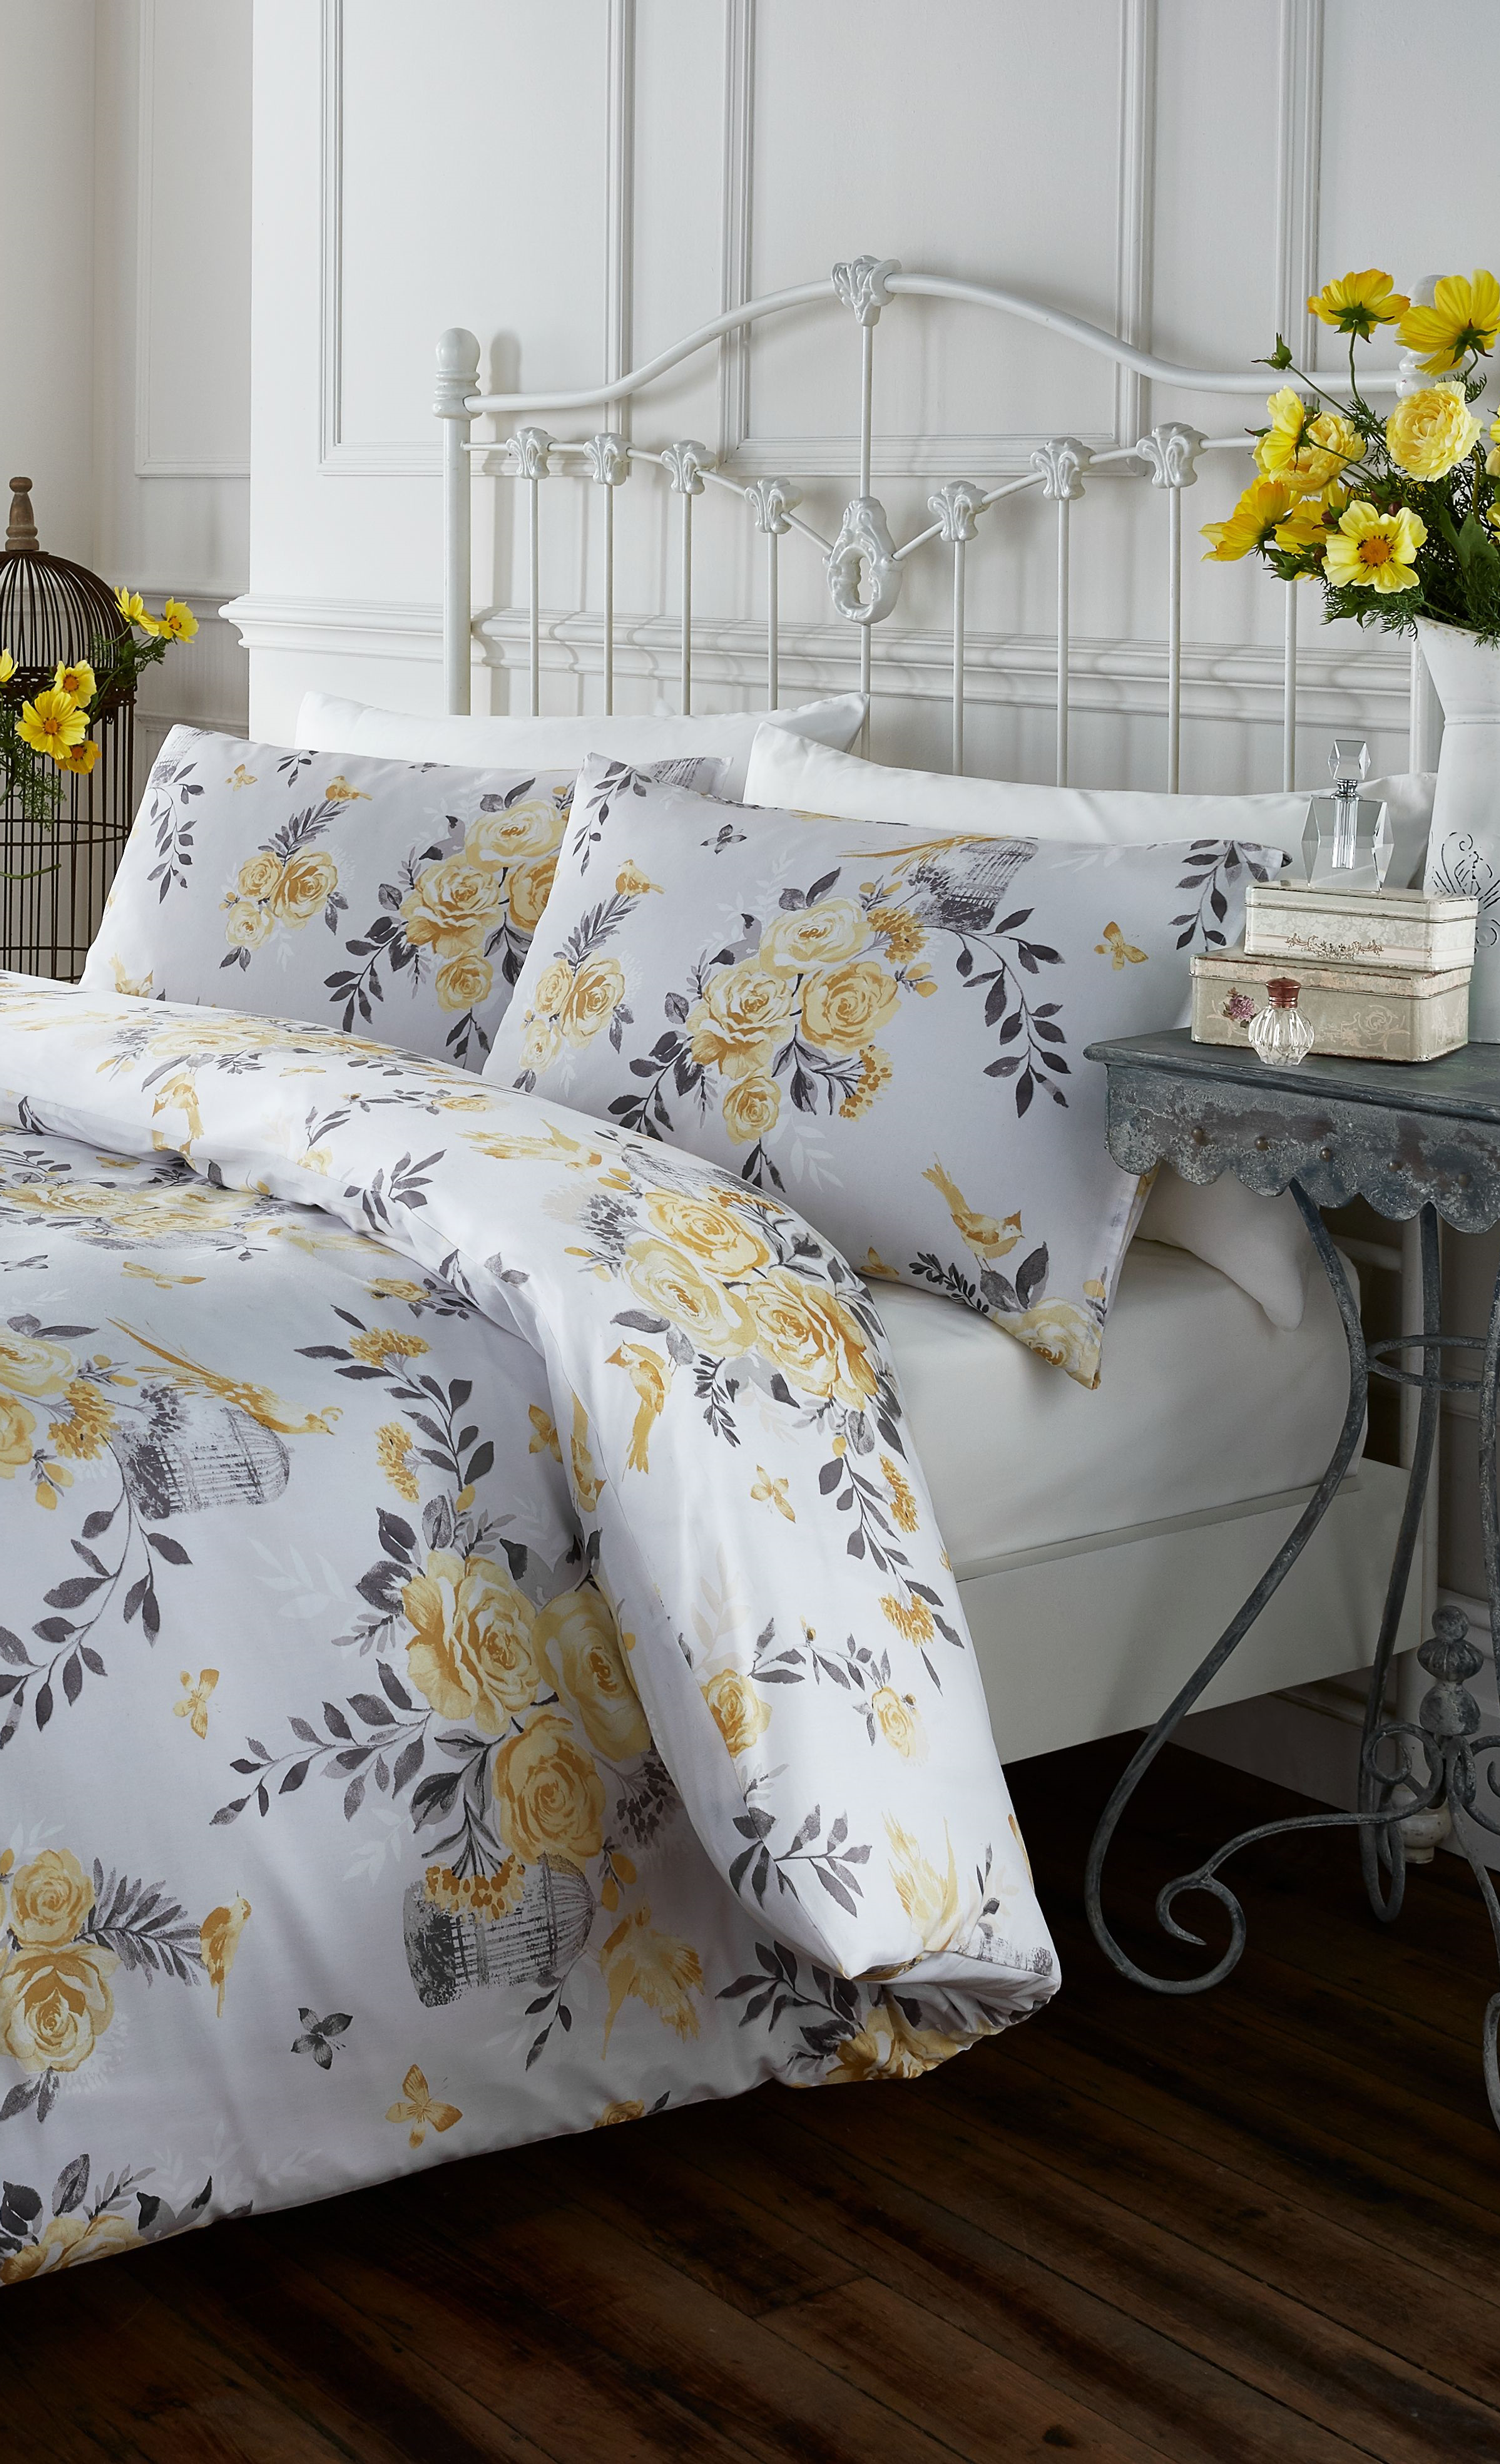 Yellow floral duvet set Comfortable bedroom, Bedroom styles